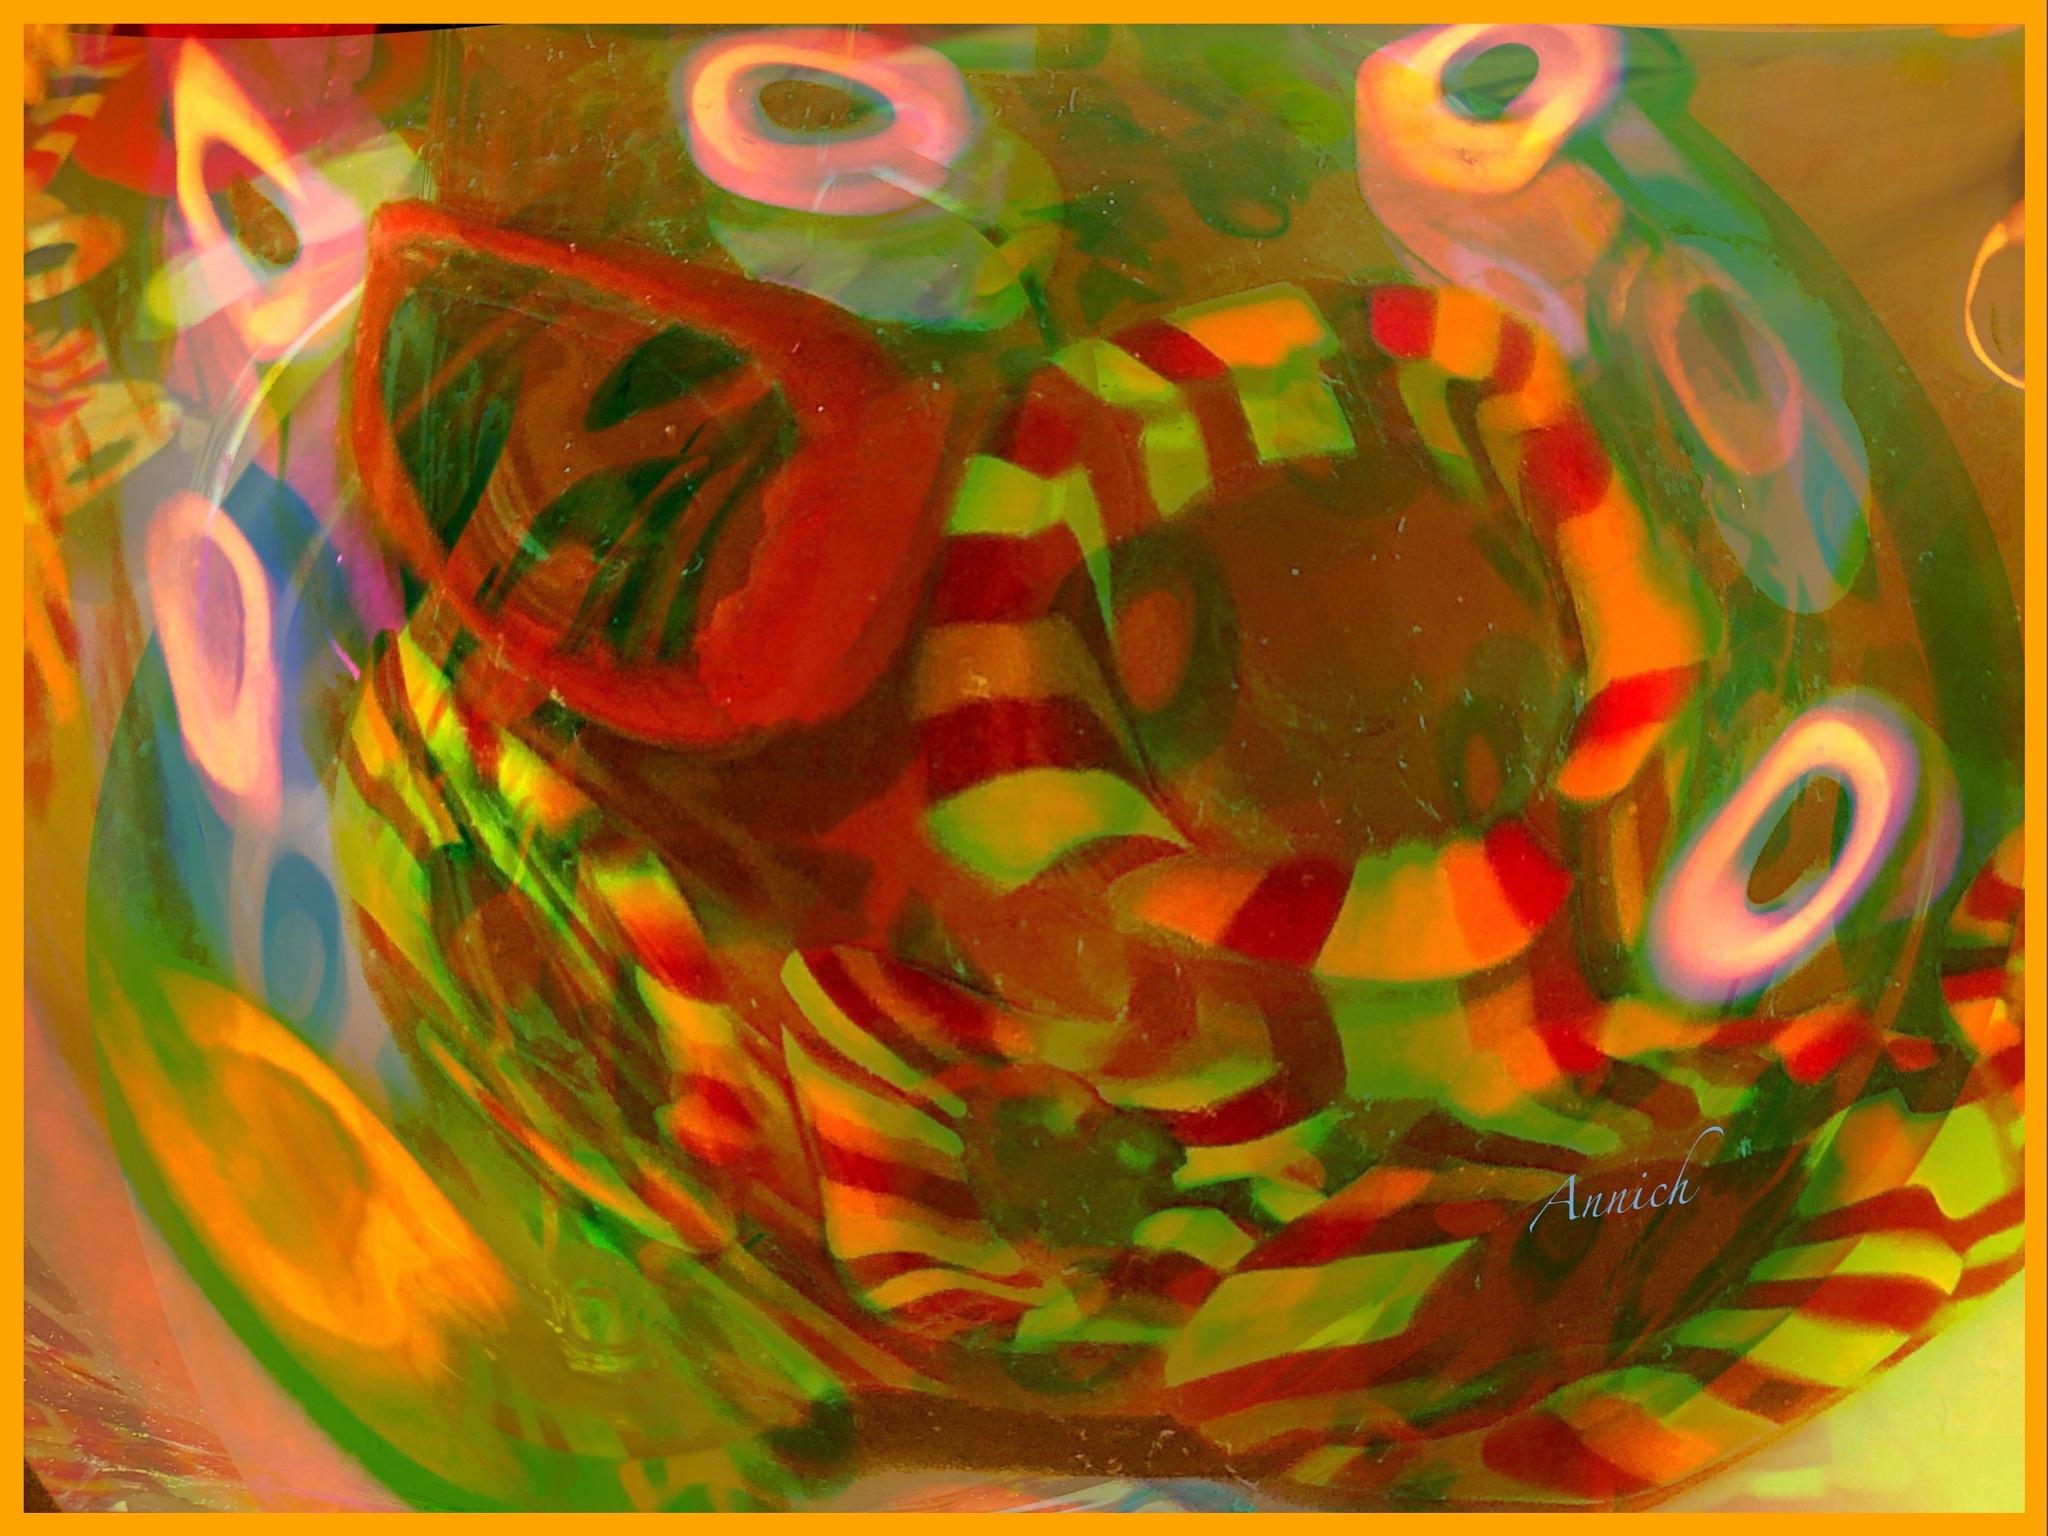 Playfulness by Annich